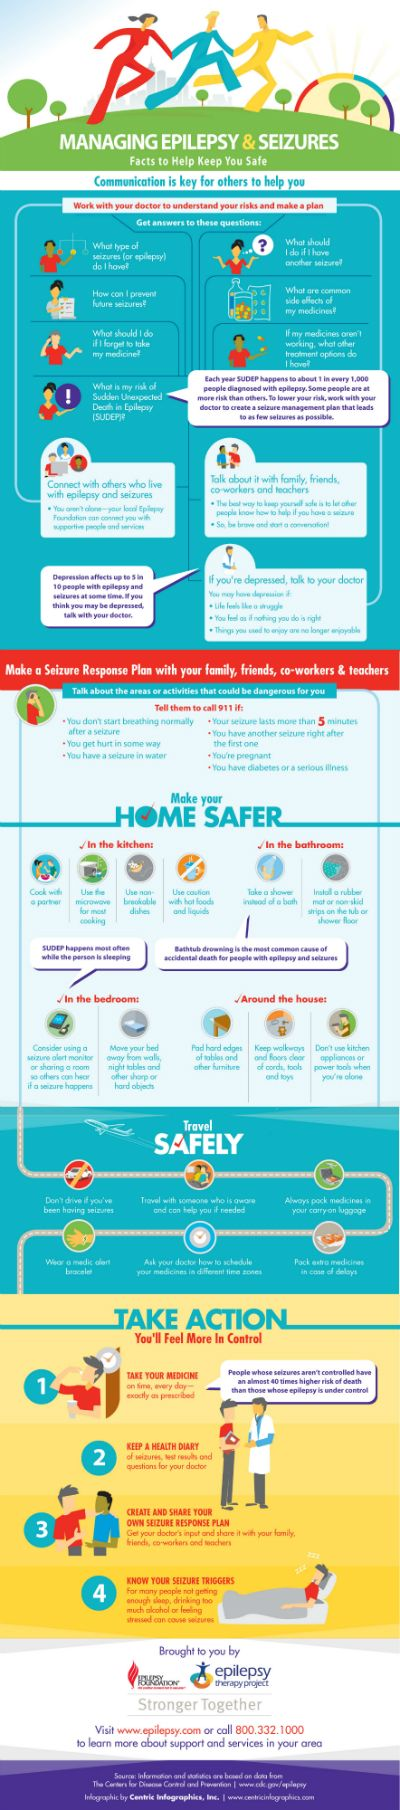 Managing Epilepsy and Seizures – Safety at Home, School, Work | epilepsy.com